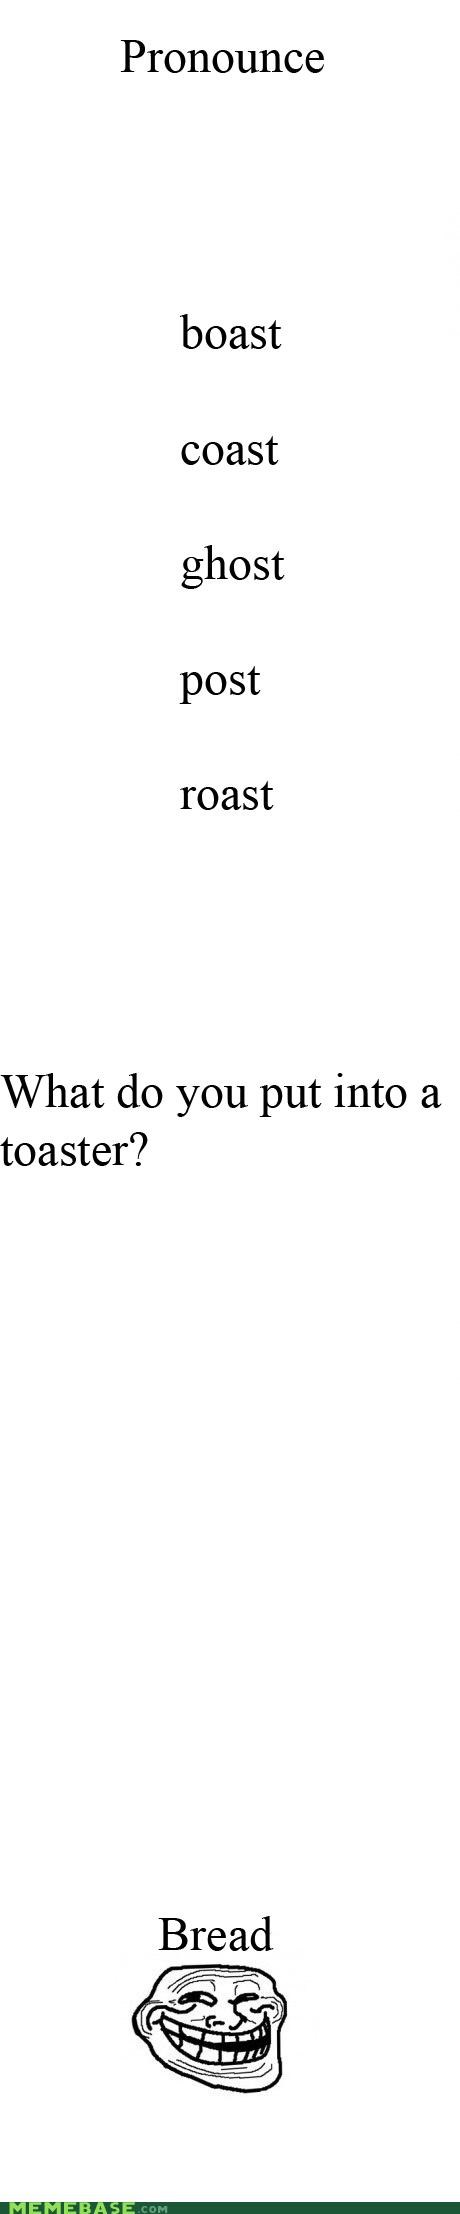 Pronunciation,quiz,toast